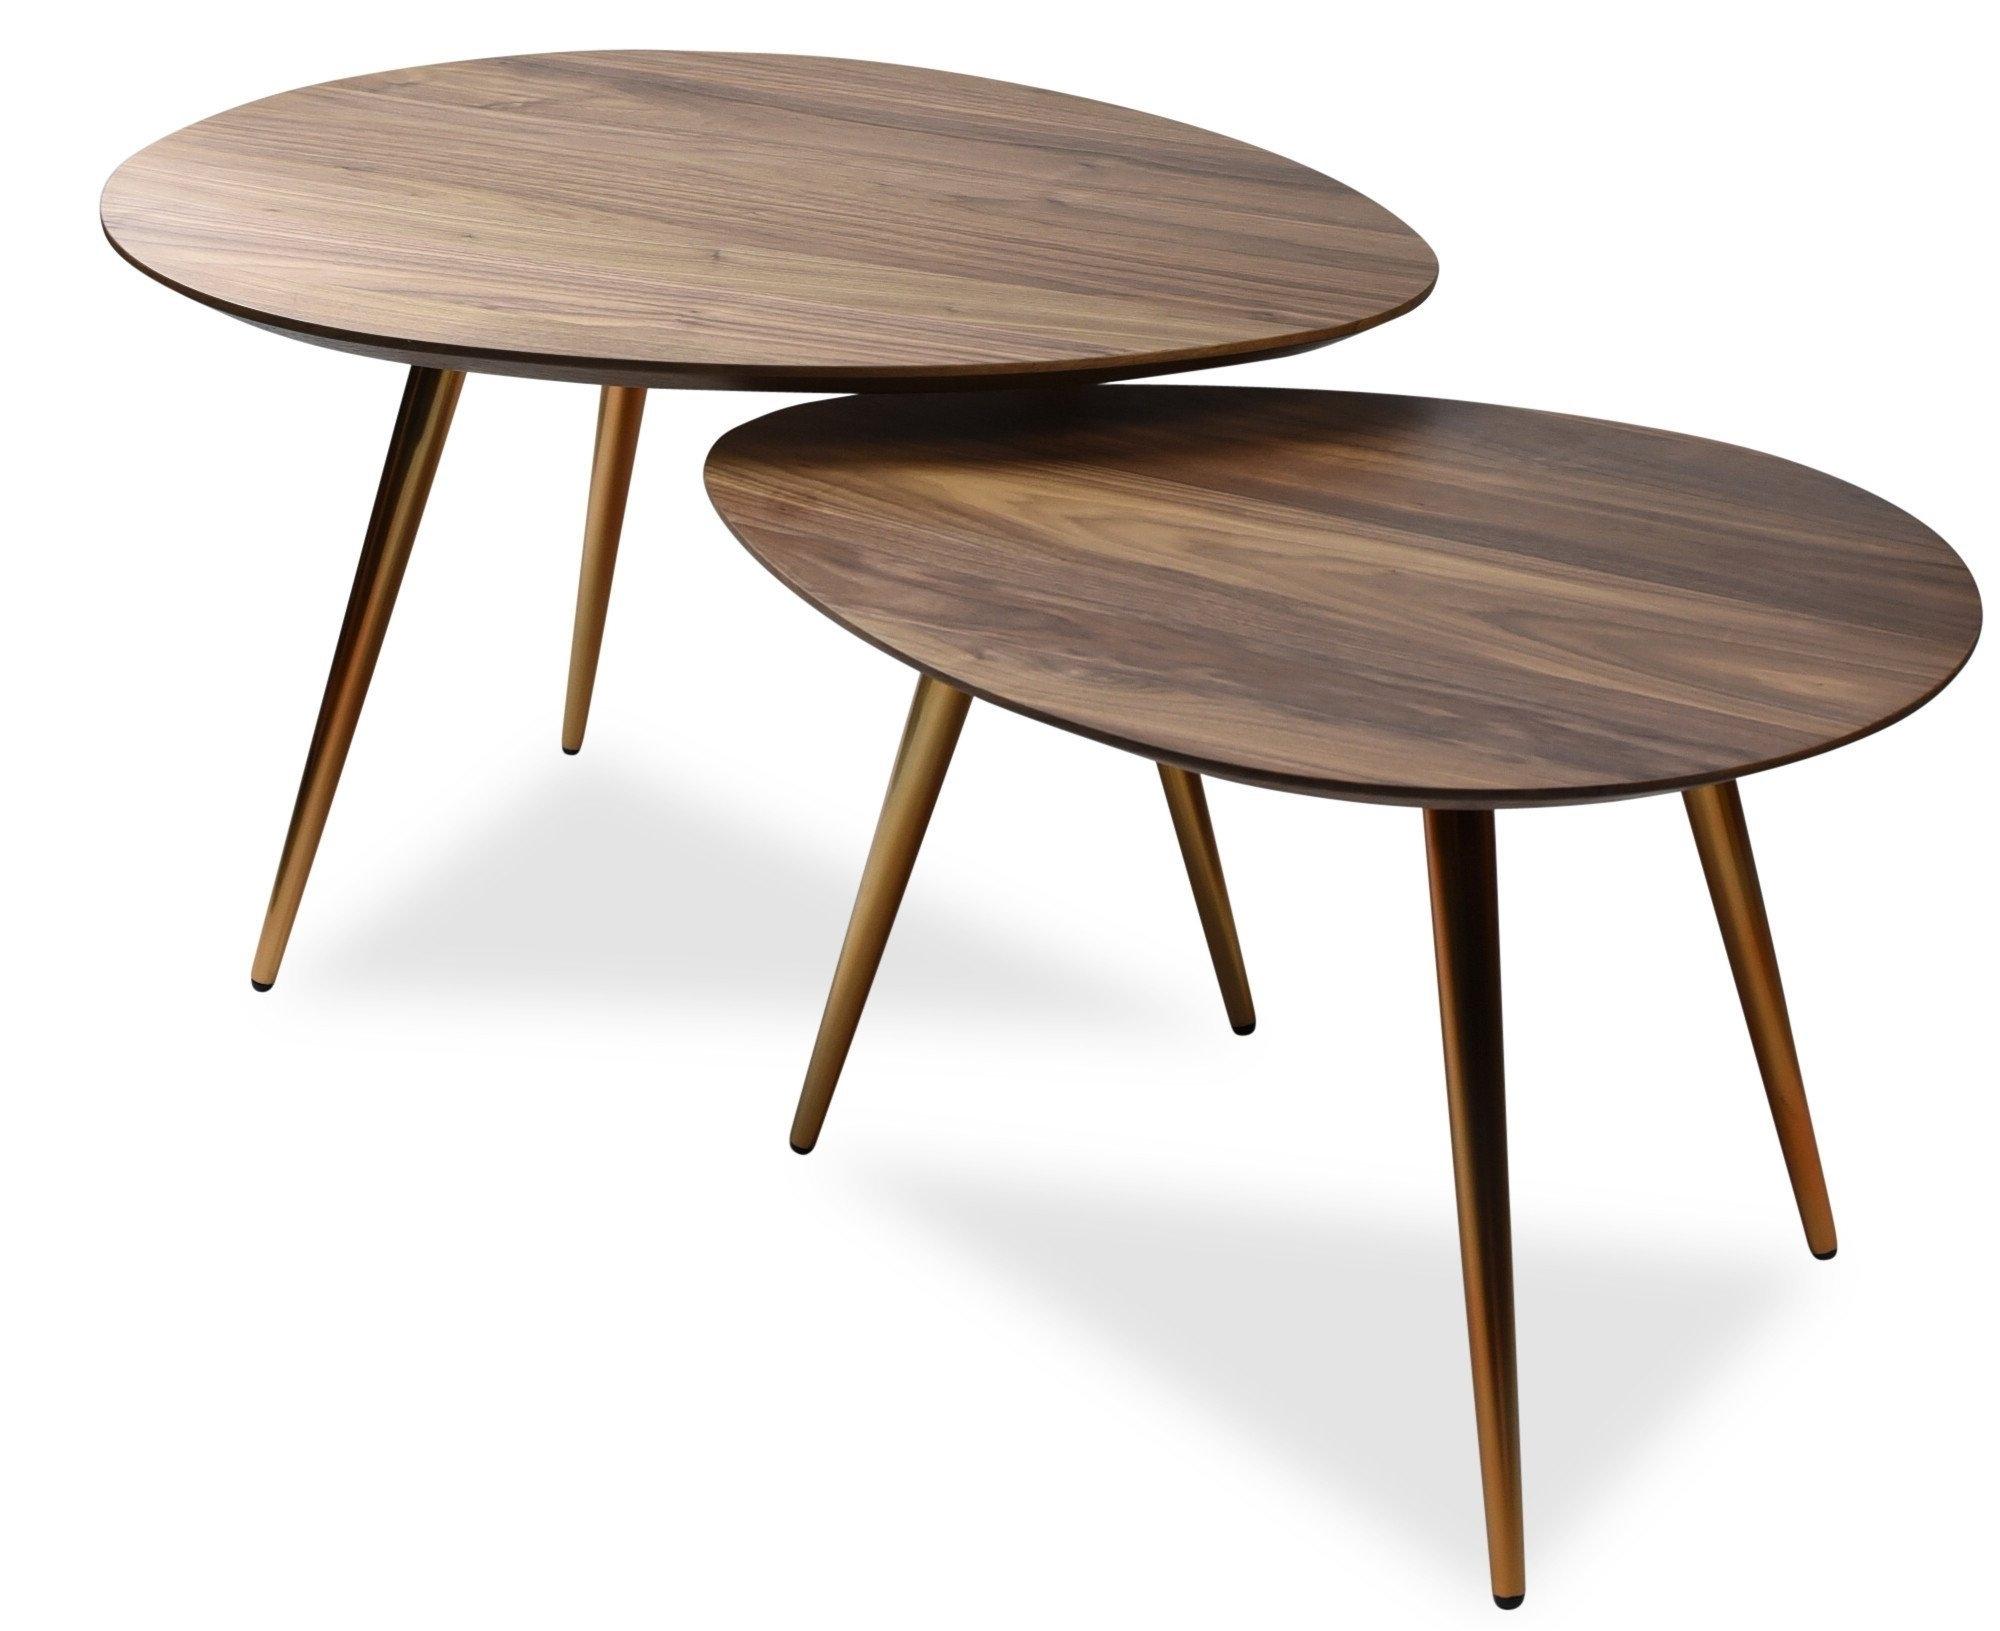 Maddox Mid-Century Modern Nesting Coffee Table Set with regard to Set of Nesting Coffee Tables (Image 17 of 30)